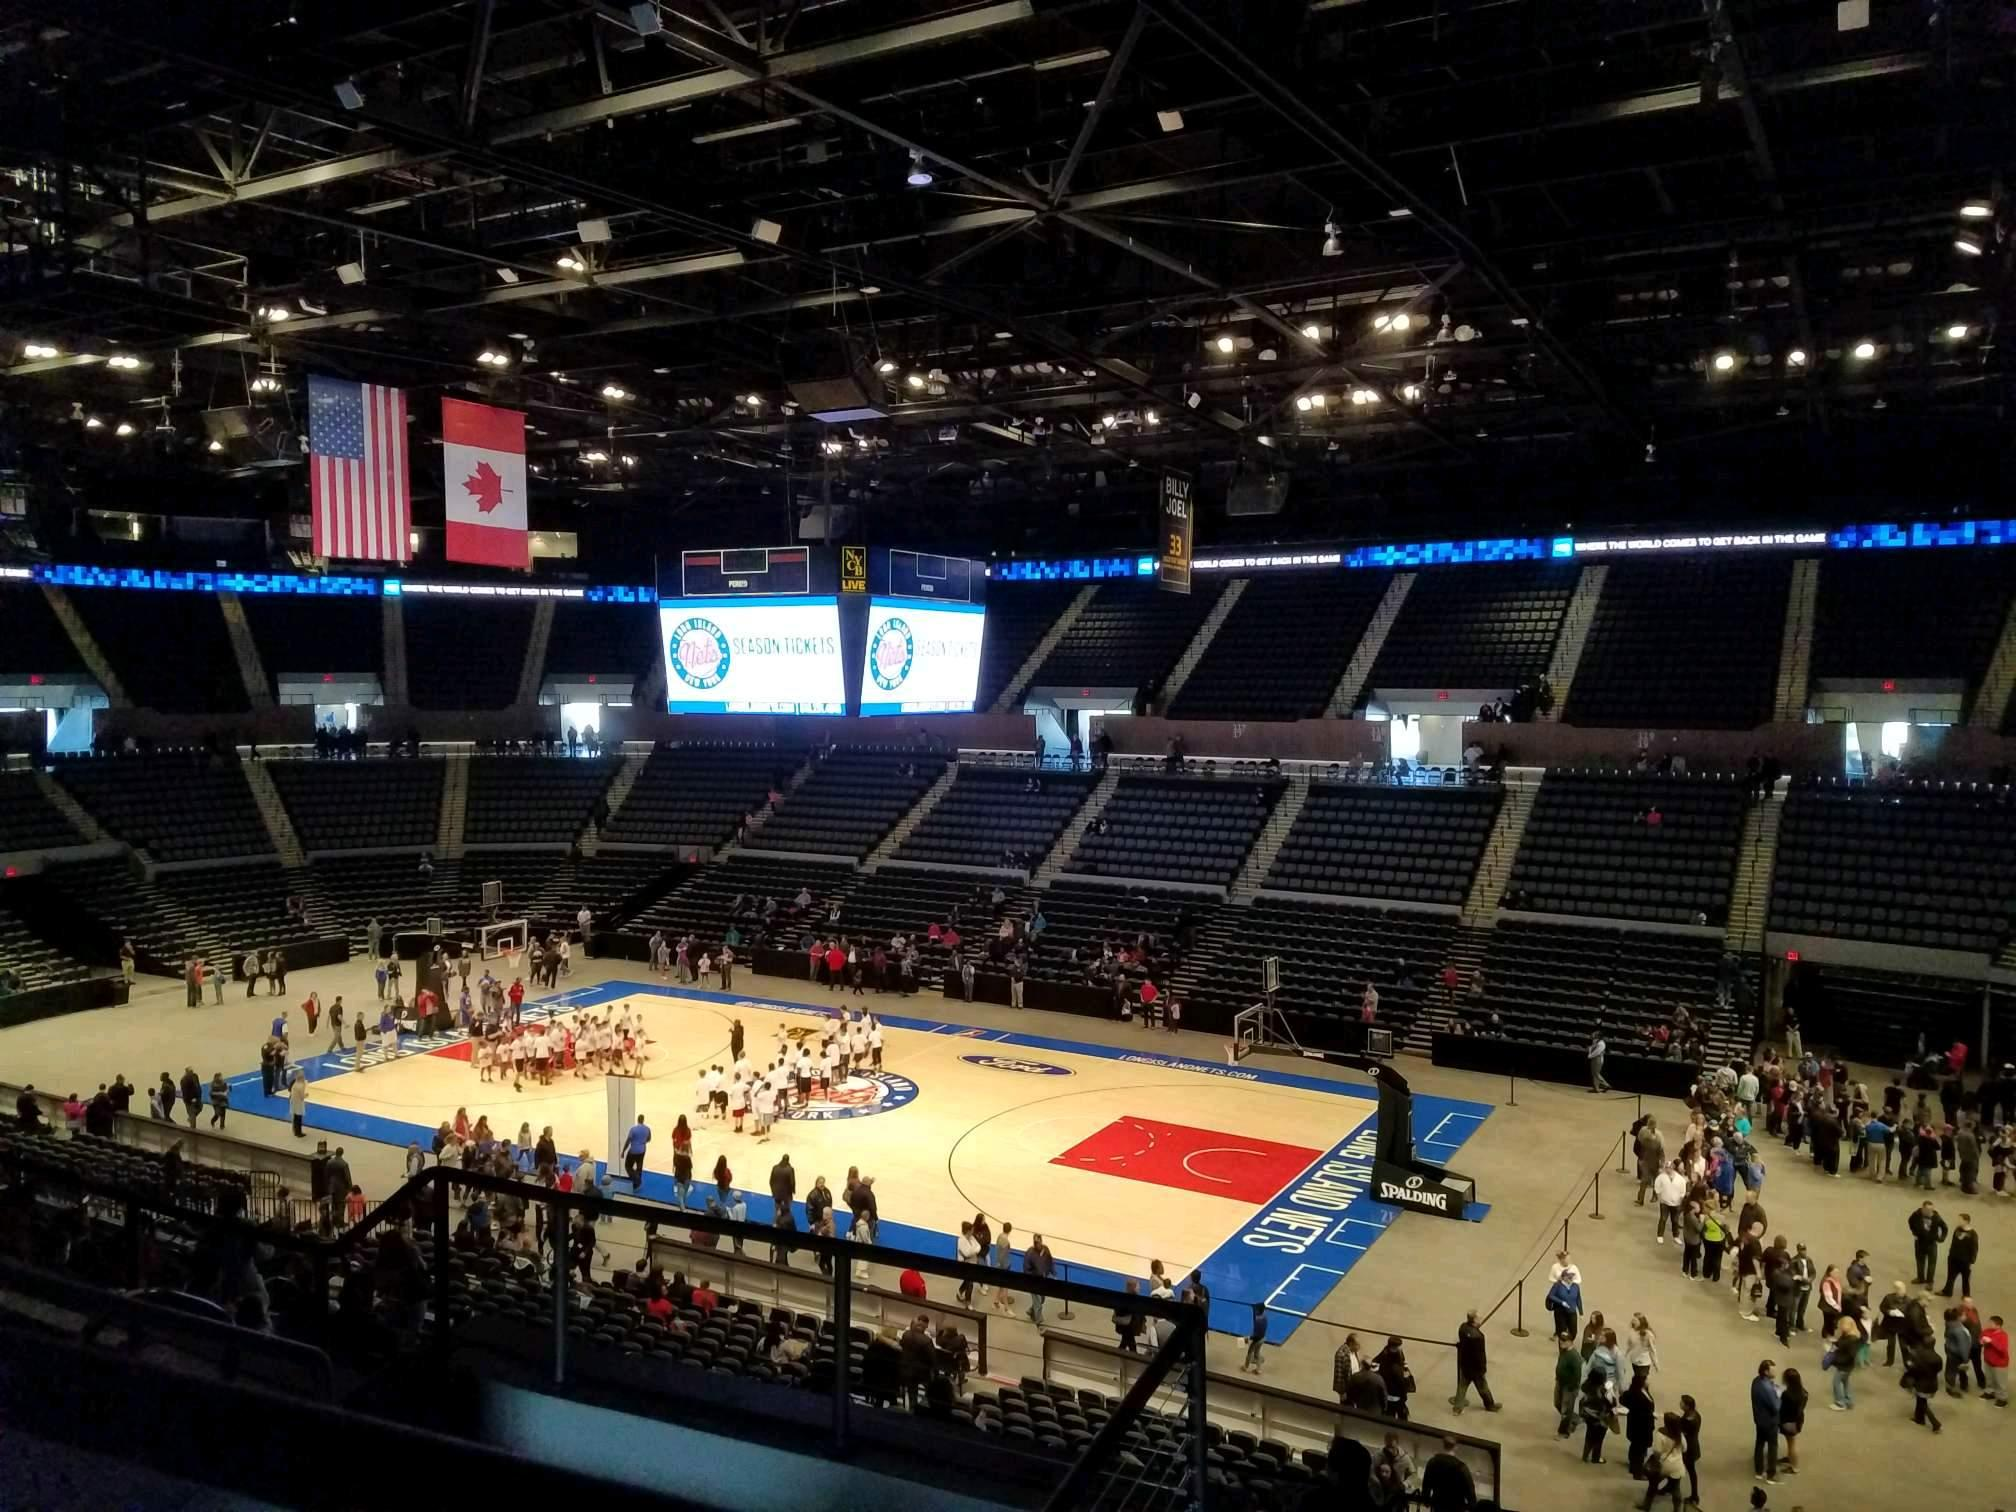 Nassau Veterans Memorial Coliseum Section 240 Row 5 Seat 6